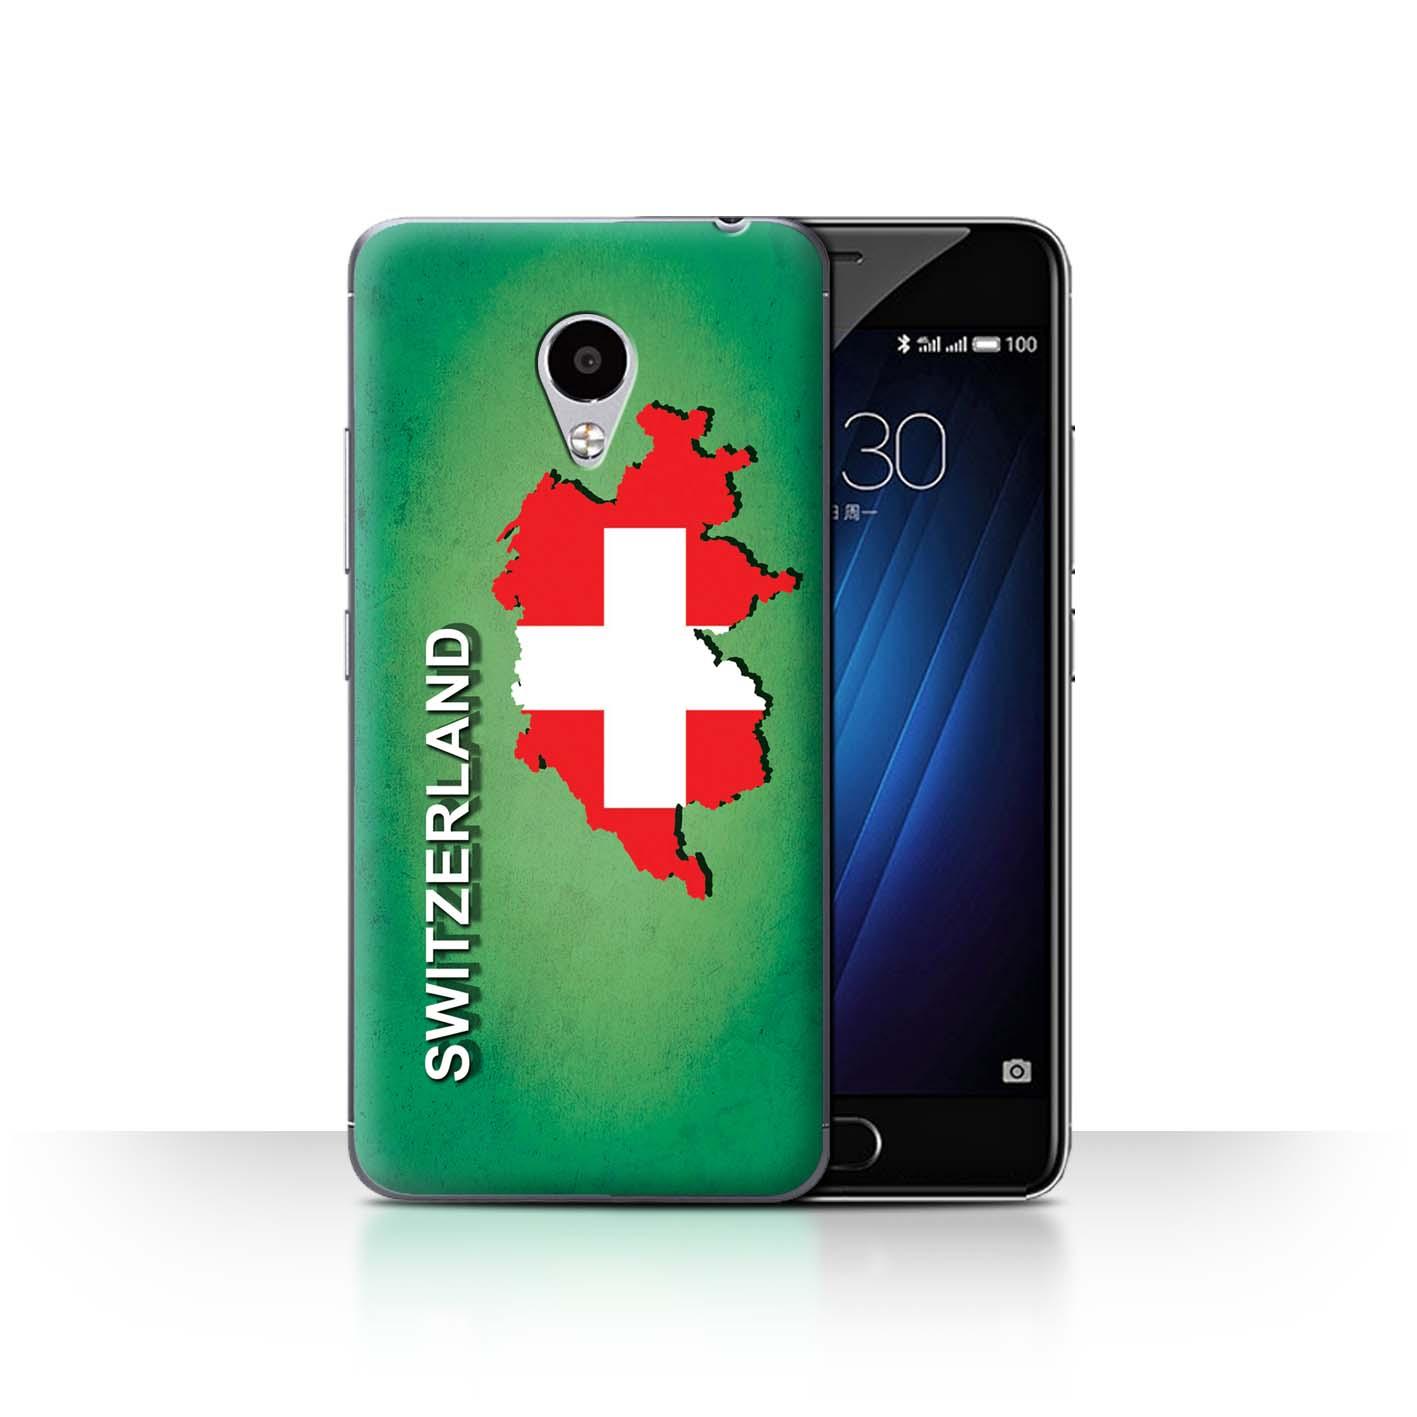 STUFF4-Back-Case-Cover-Skin-for-Meizu-M3S-Flag-Nations